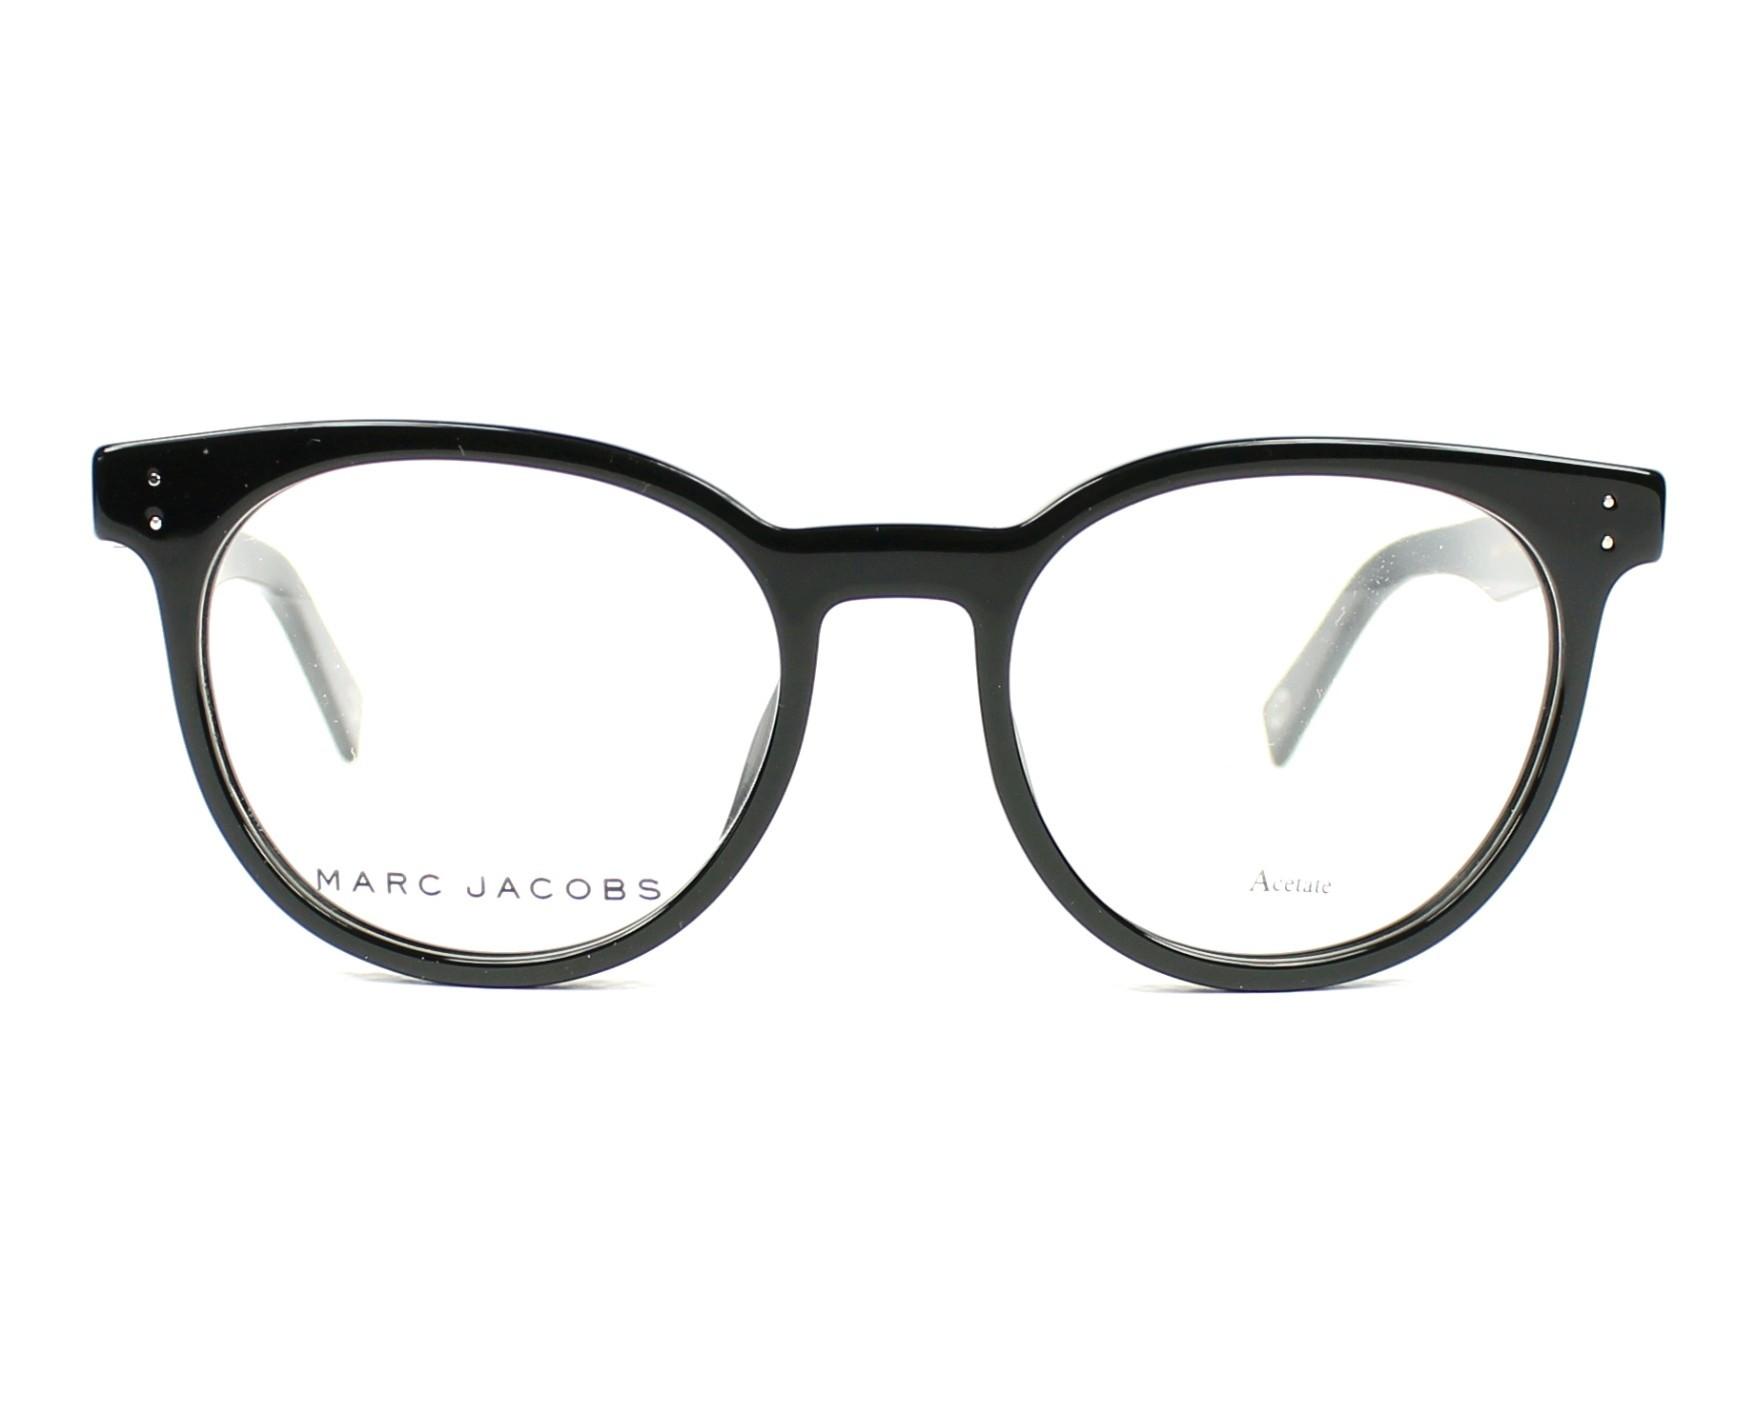 c09eac5dde6b7 eyeglasses Marc Jacobs MARC-126 807 - Black front view